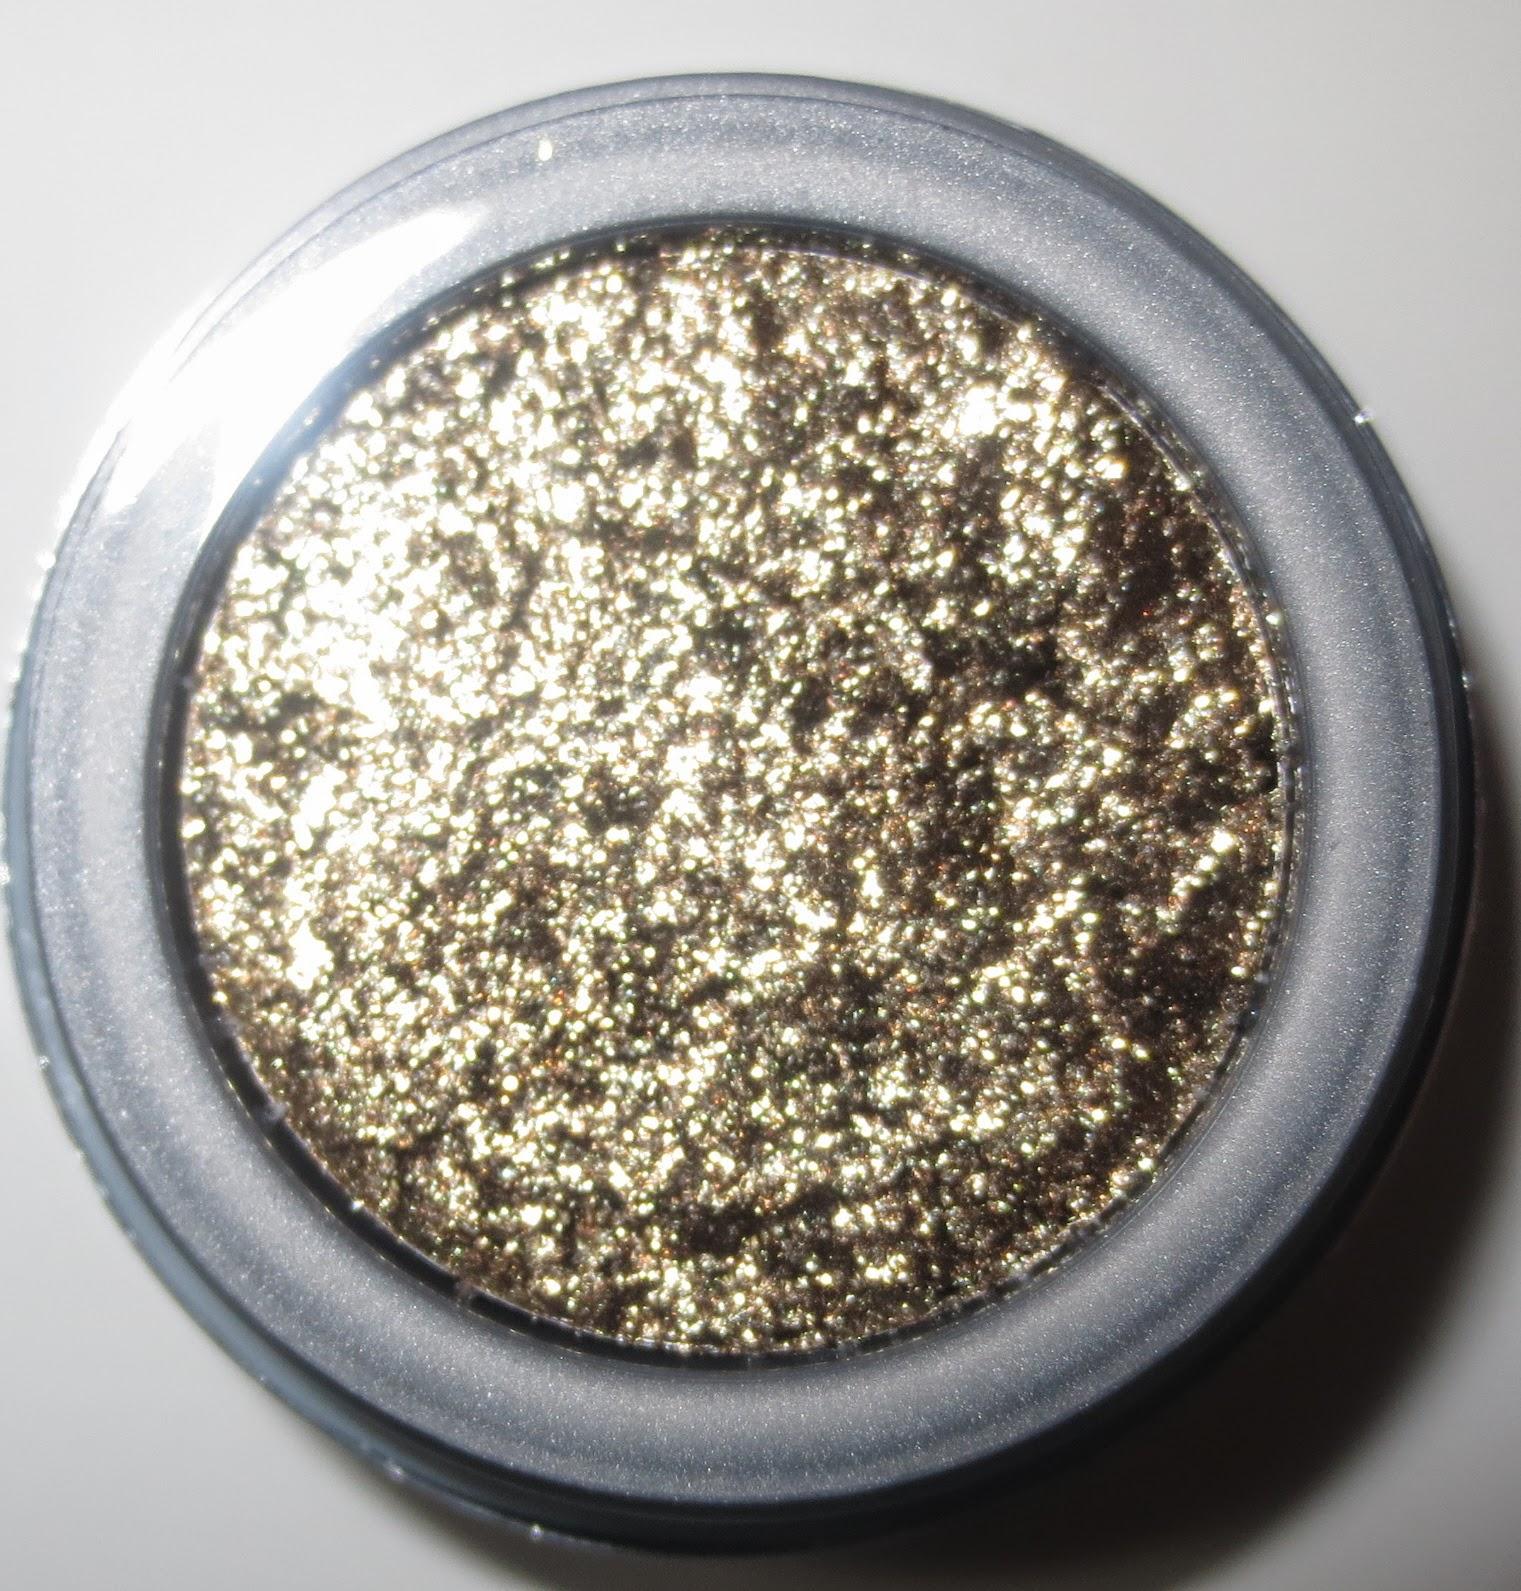 Stila Magnificent Metals Foil Finish Eye Shadow - Vintage Black Gold